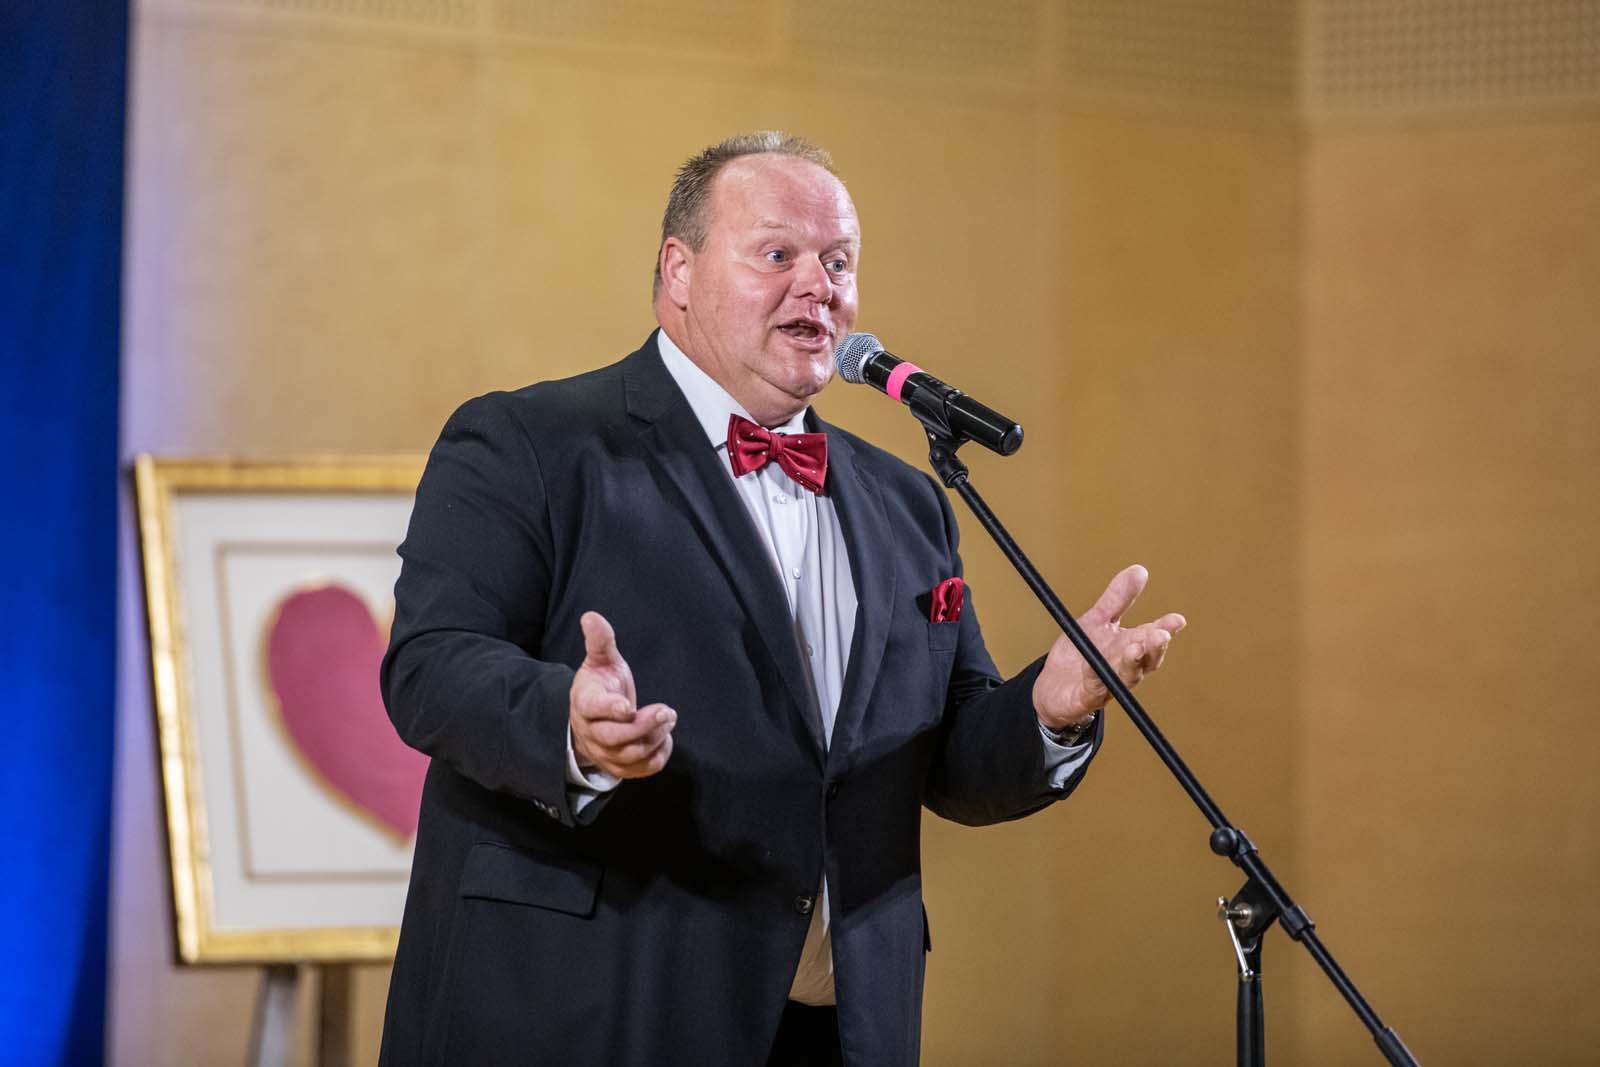 Winni Biermann Unicef Musik Gala